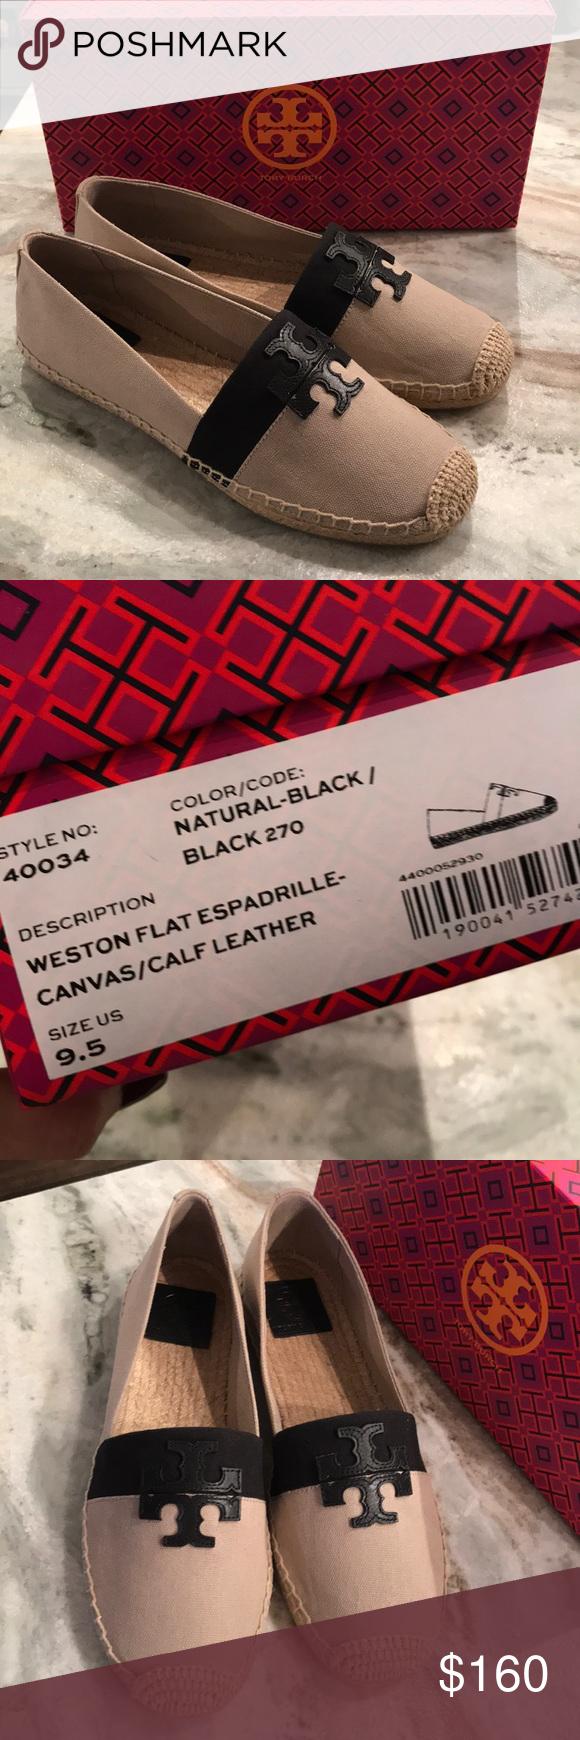 3f5657036d520 NIB TORY BURCH WESTON FLAT ESPADRILLE CANVAS 9.5 AUTHENTIC AND BRAND NEW IN  BOX NO DUST BAG NATURAL BLACK COLOR BLOCK SZ 9.5 ❌❌NO BUNDLE DISCOUNT❌❌ Tory  ...